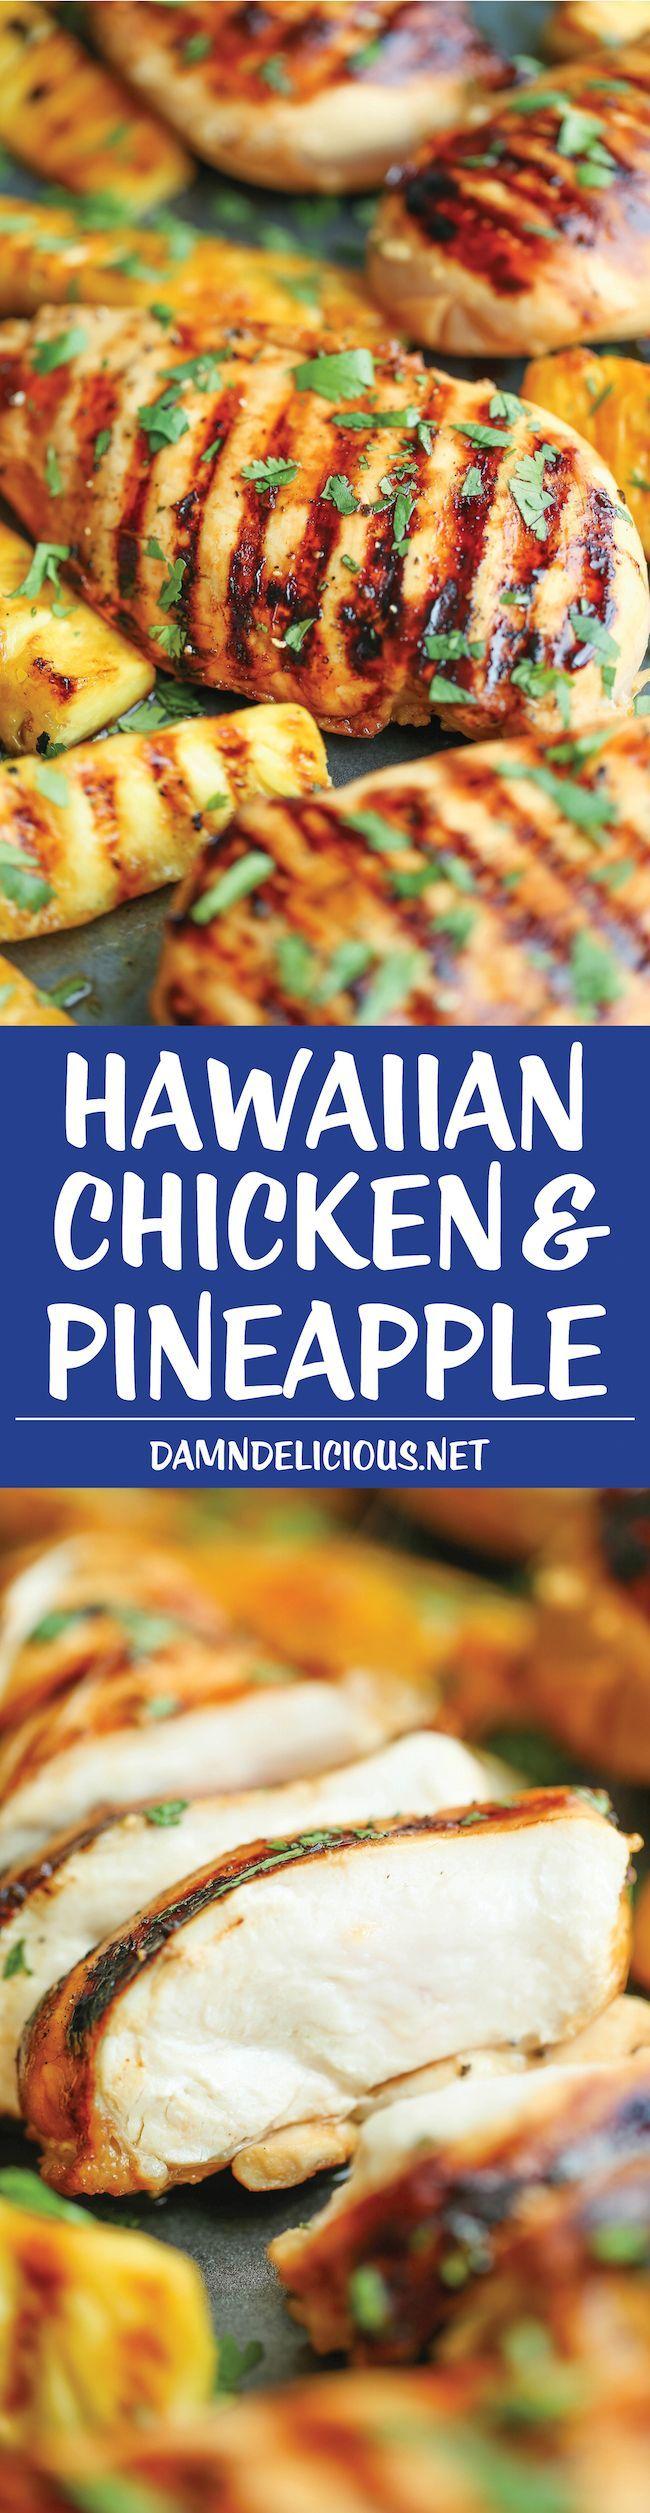 Hawaiian Chicken and Pineapple